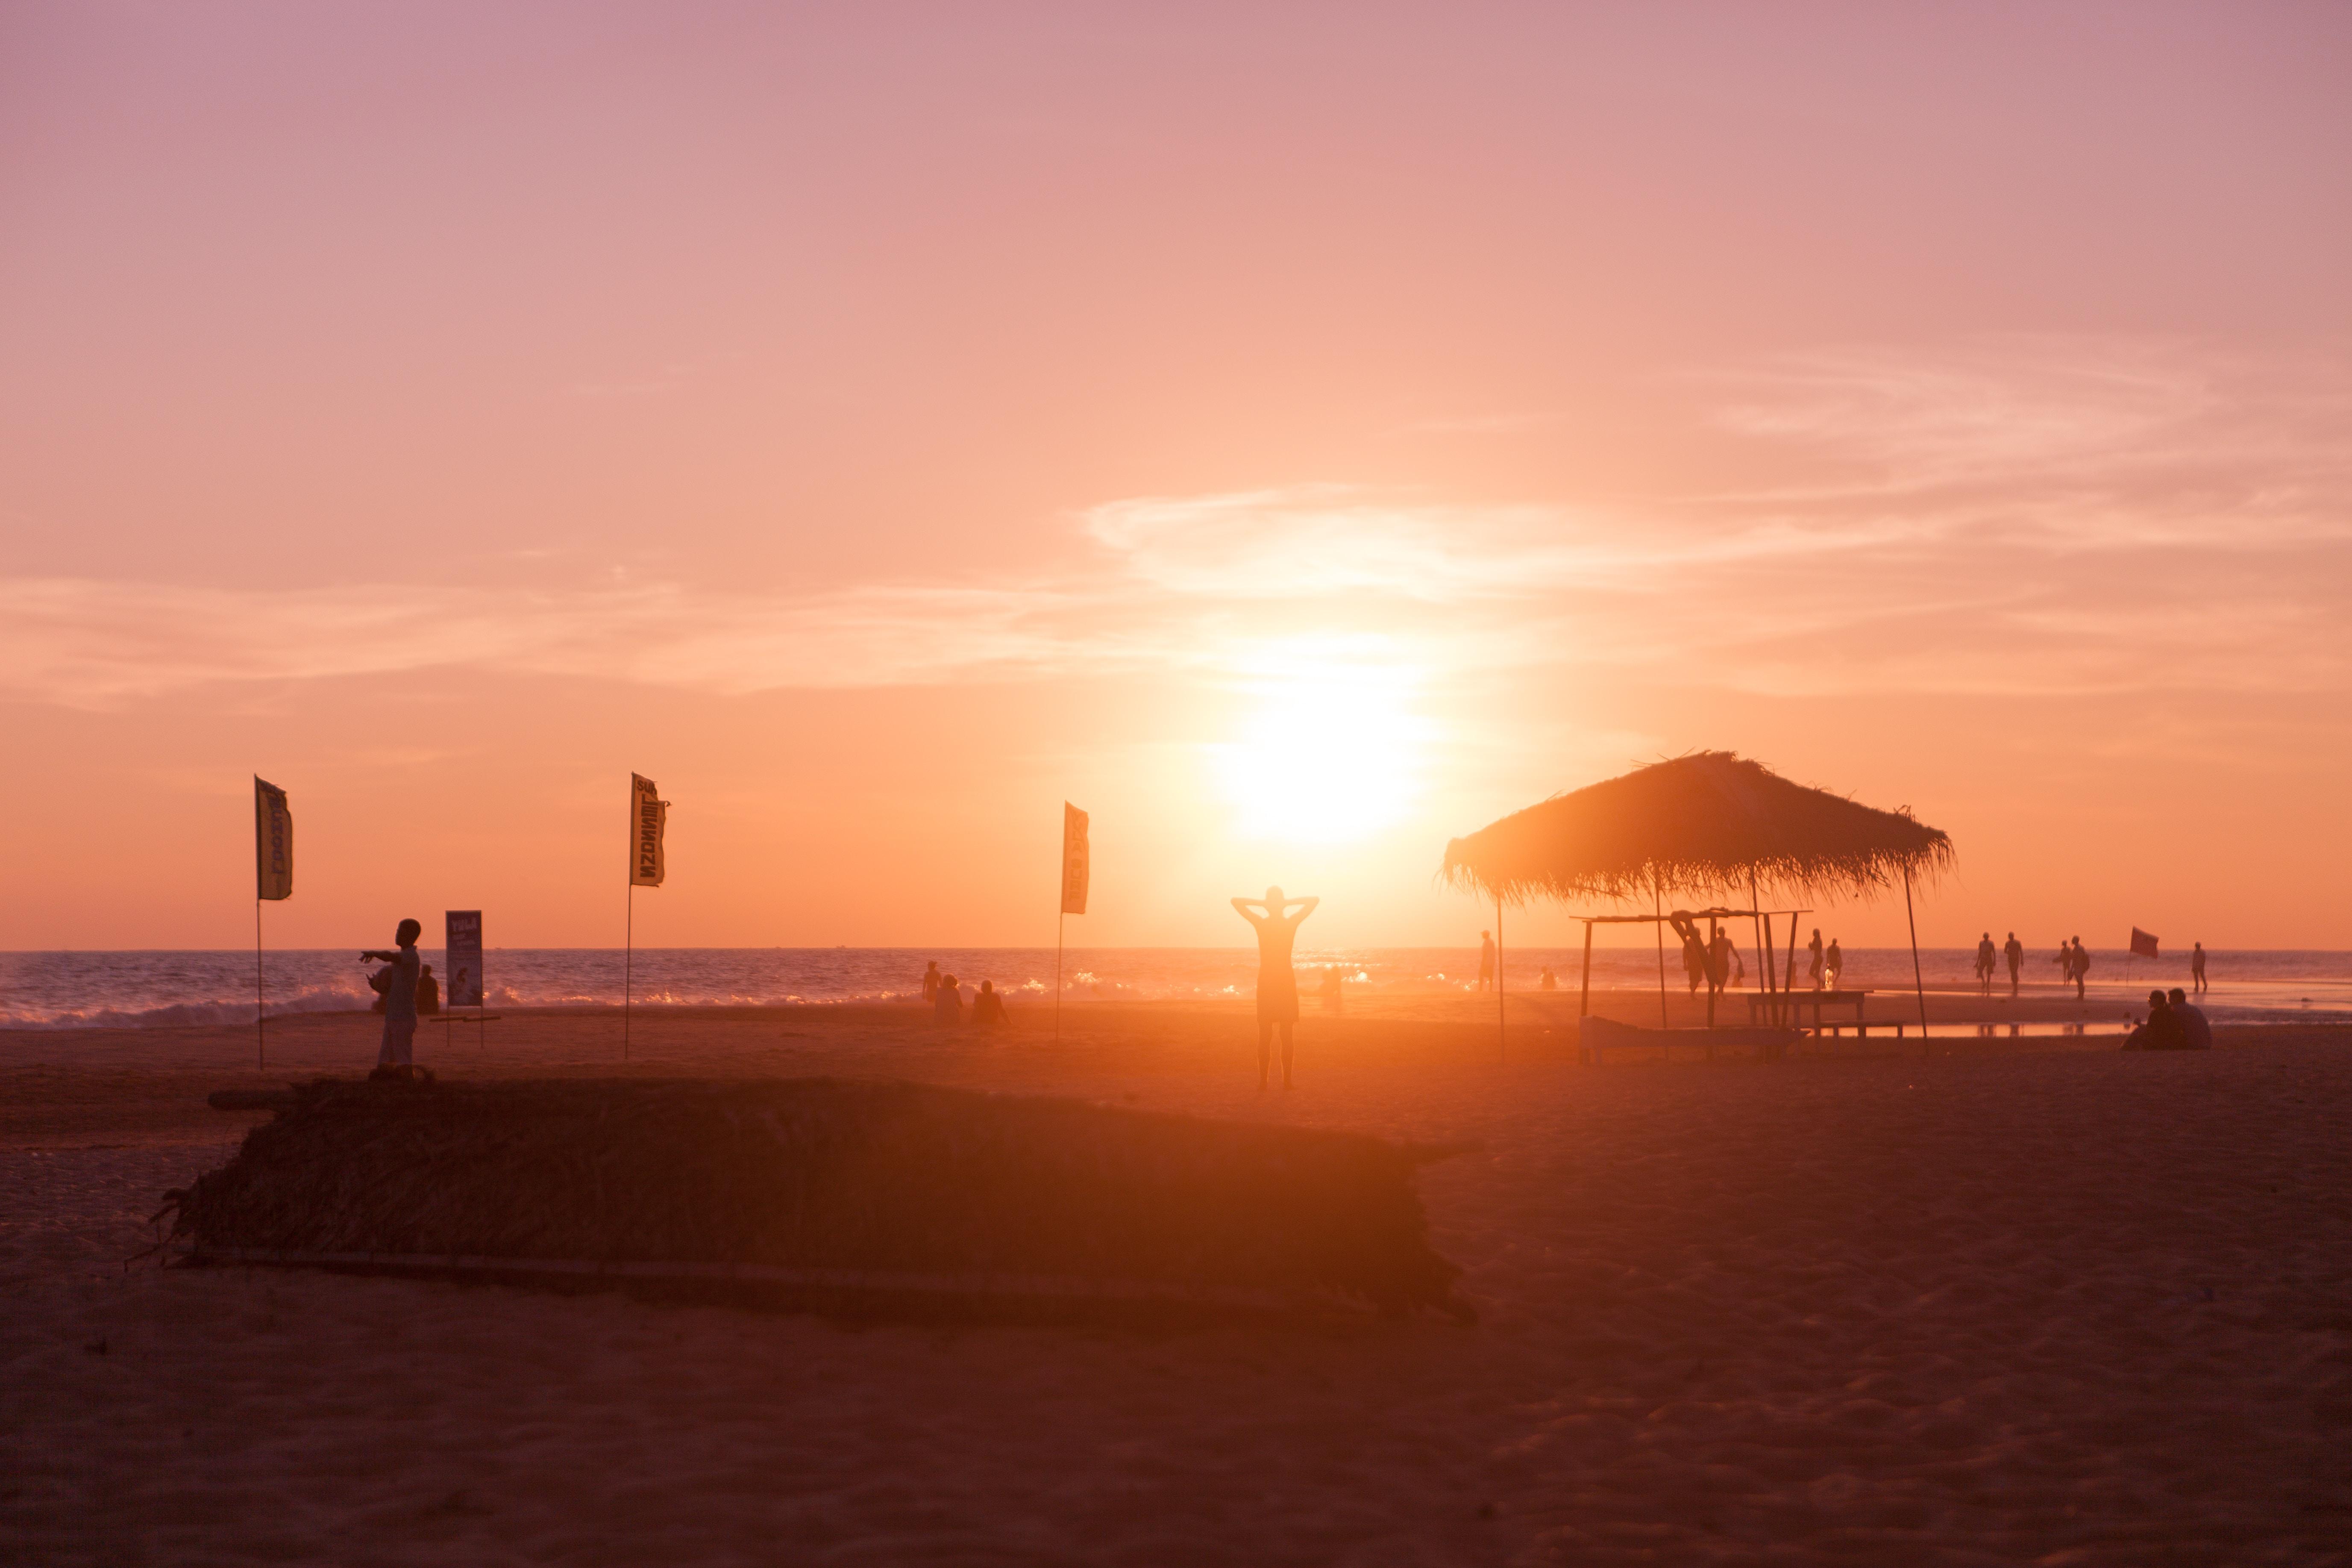 silhouette beach hut near seashore during sunset